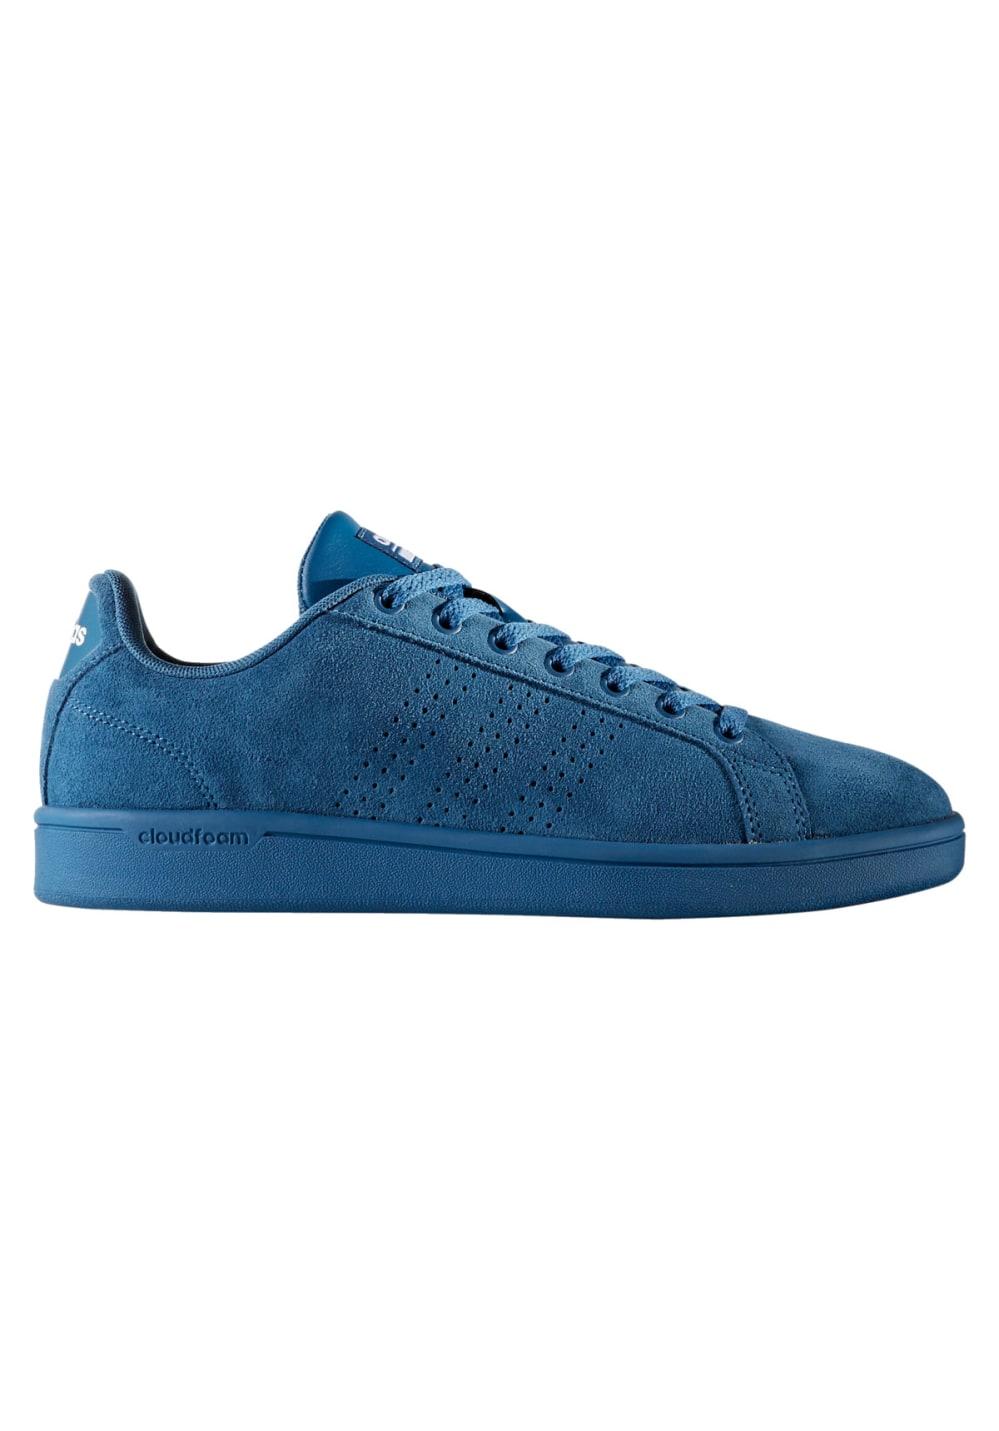 adidas neo Cloudfoam Advantage Clean - Sneaker für Damen - Blau